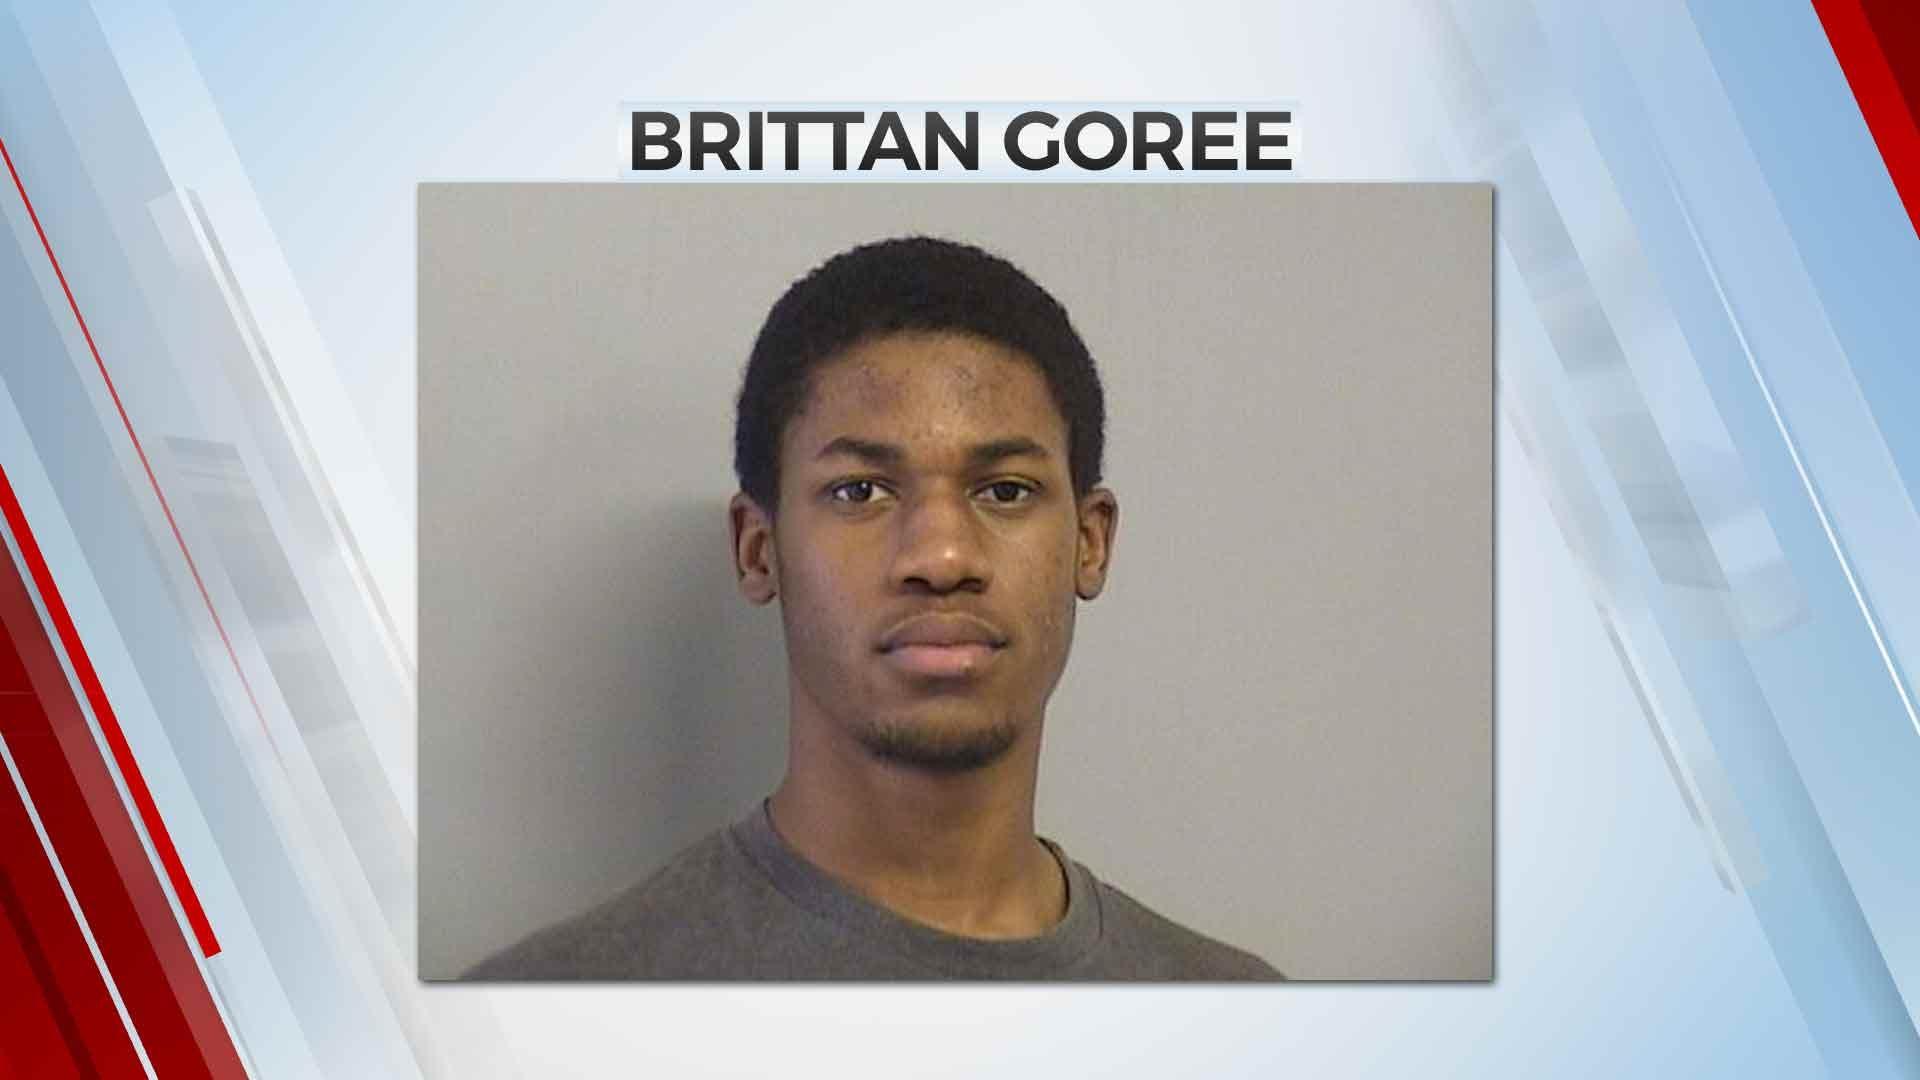 Tulsa Man Arrested On Child Porn Complaints After Citizen Tip